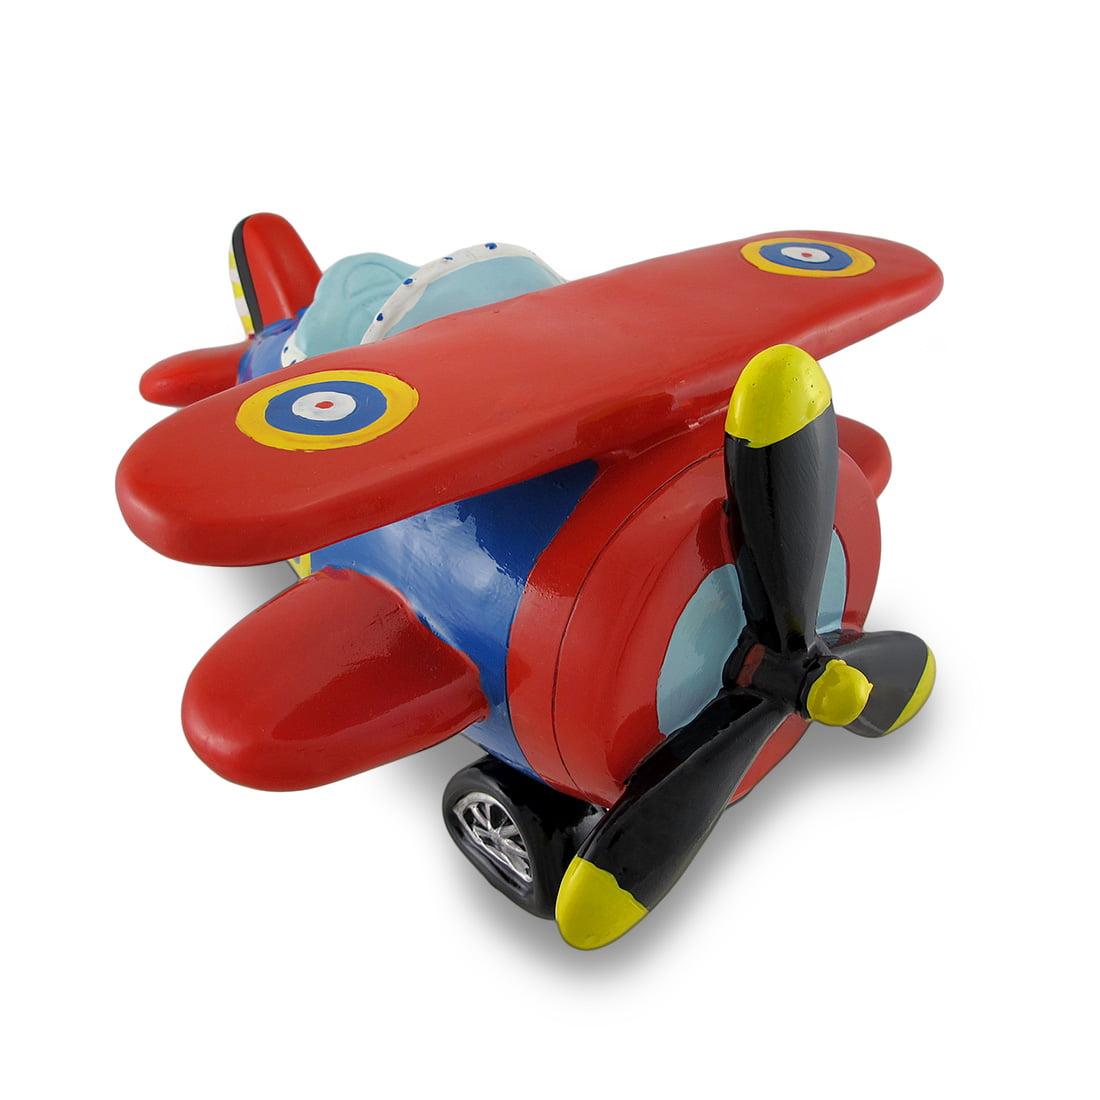 Red Blue Bi-Plane Large Piggy Bank Biplane by King Max